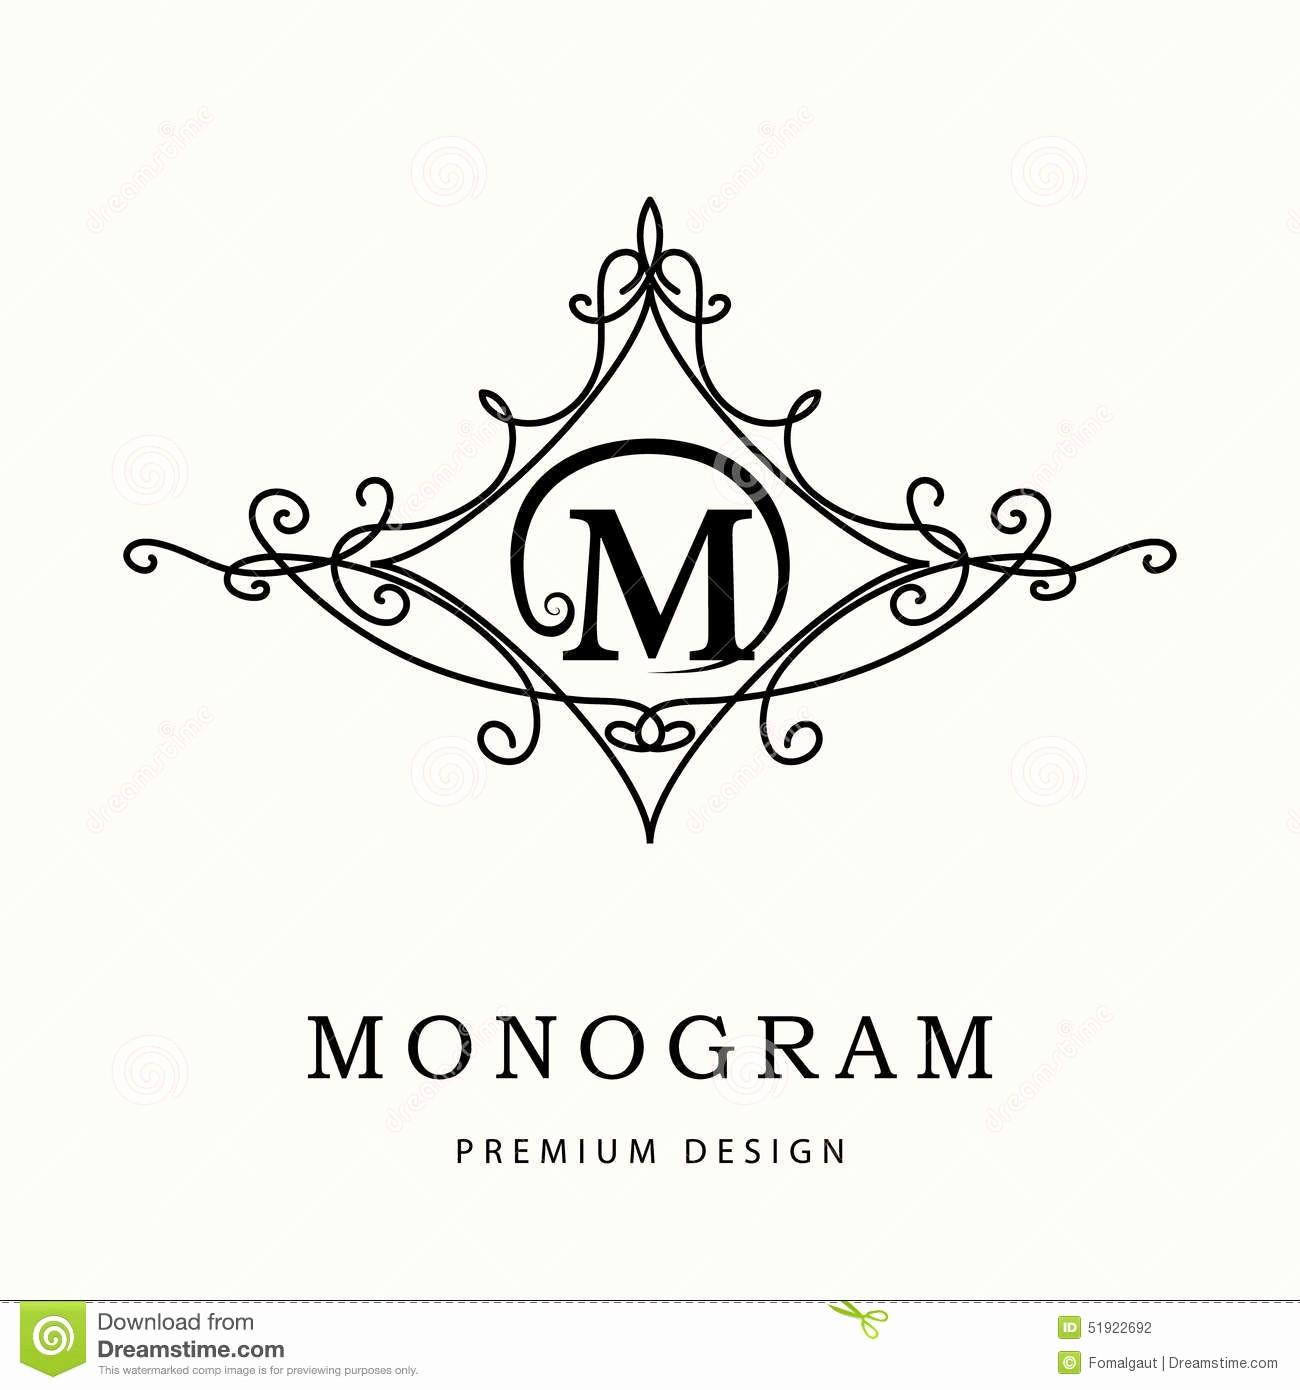 Free Monogram Template for Word Unique Monogram Design Elements Graceful Template Elegant Line